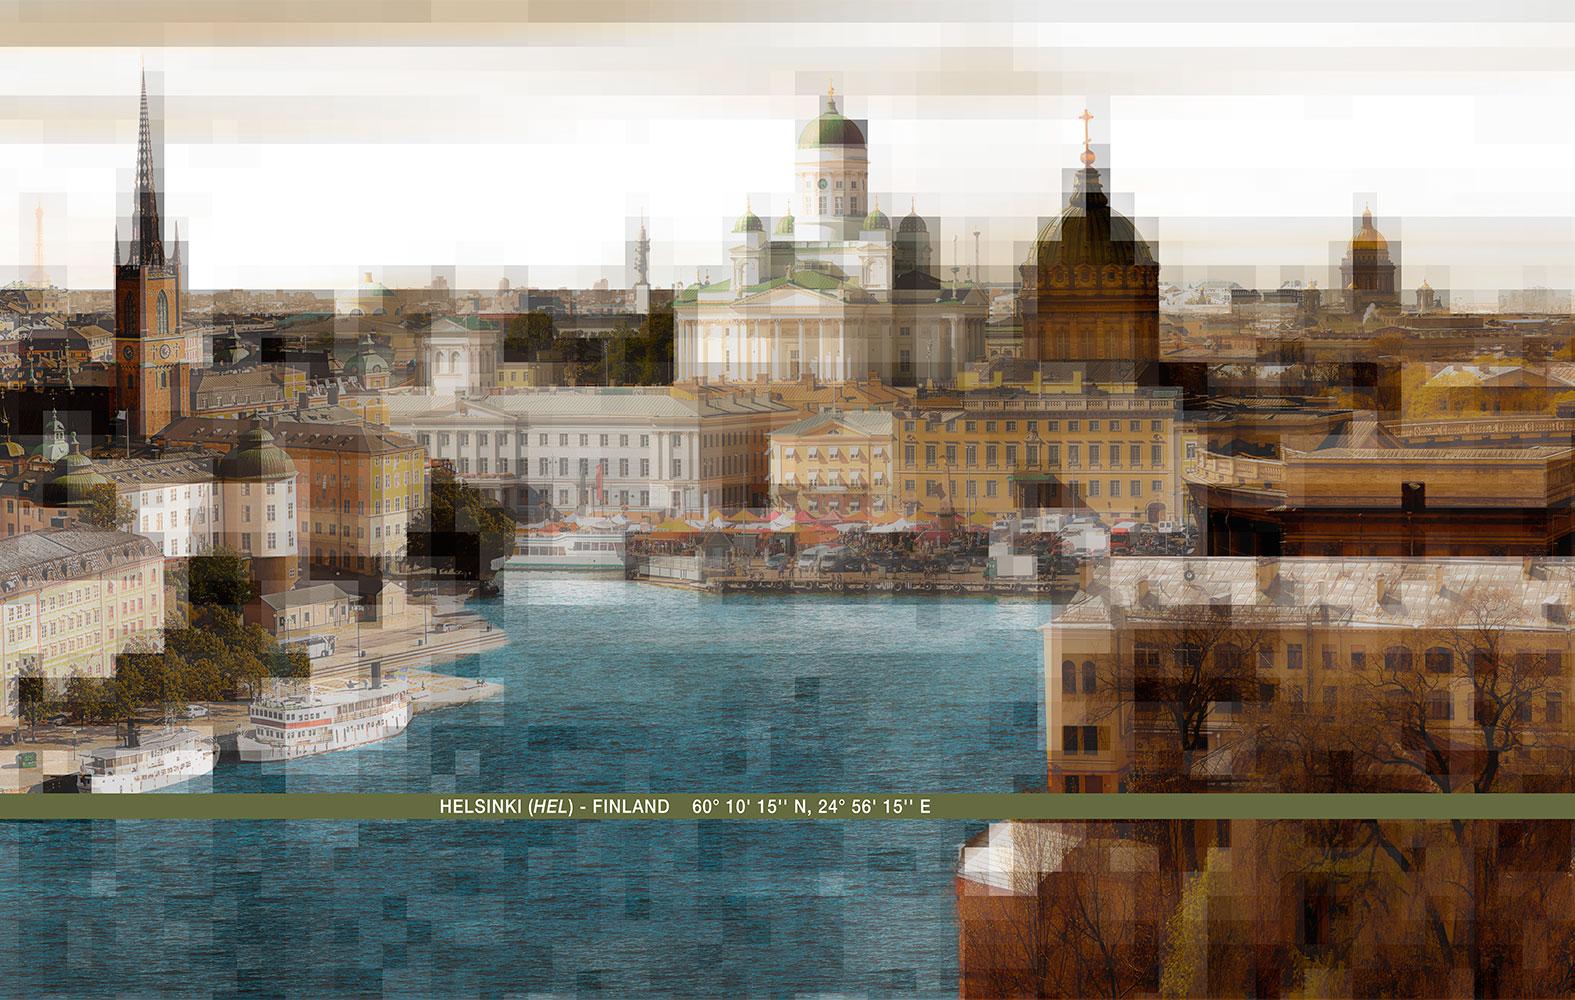 StudioErnst-HMShost-cityscapes-helsinki